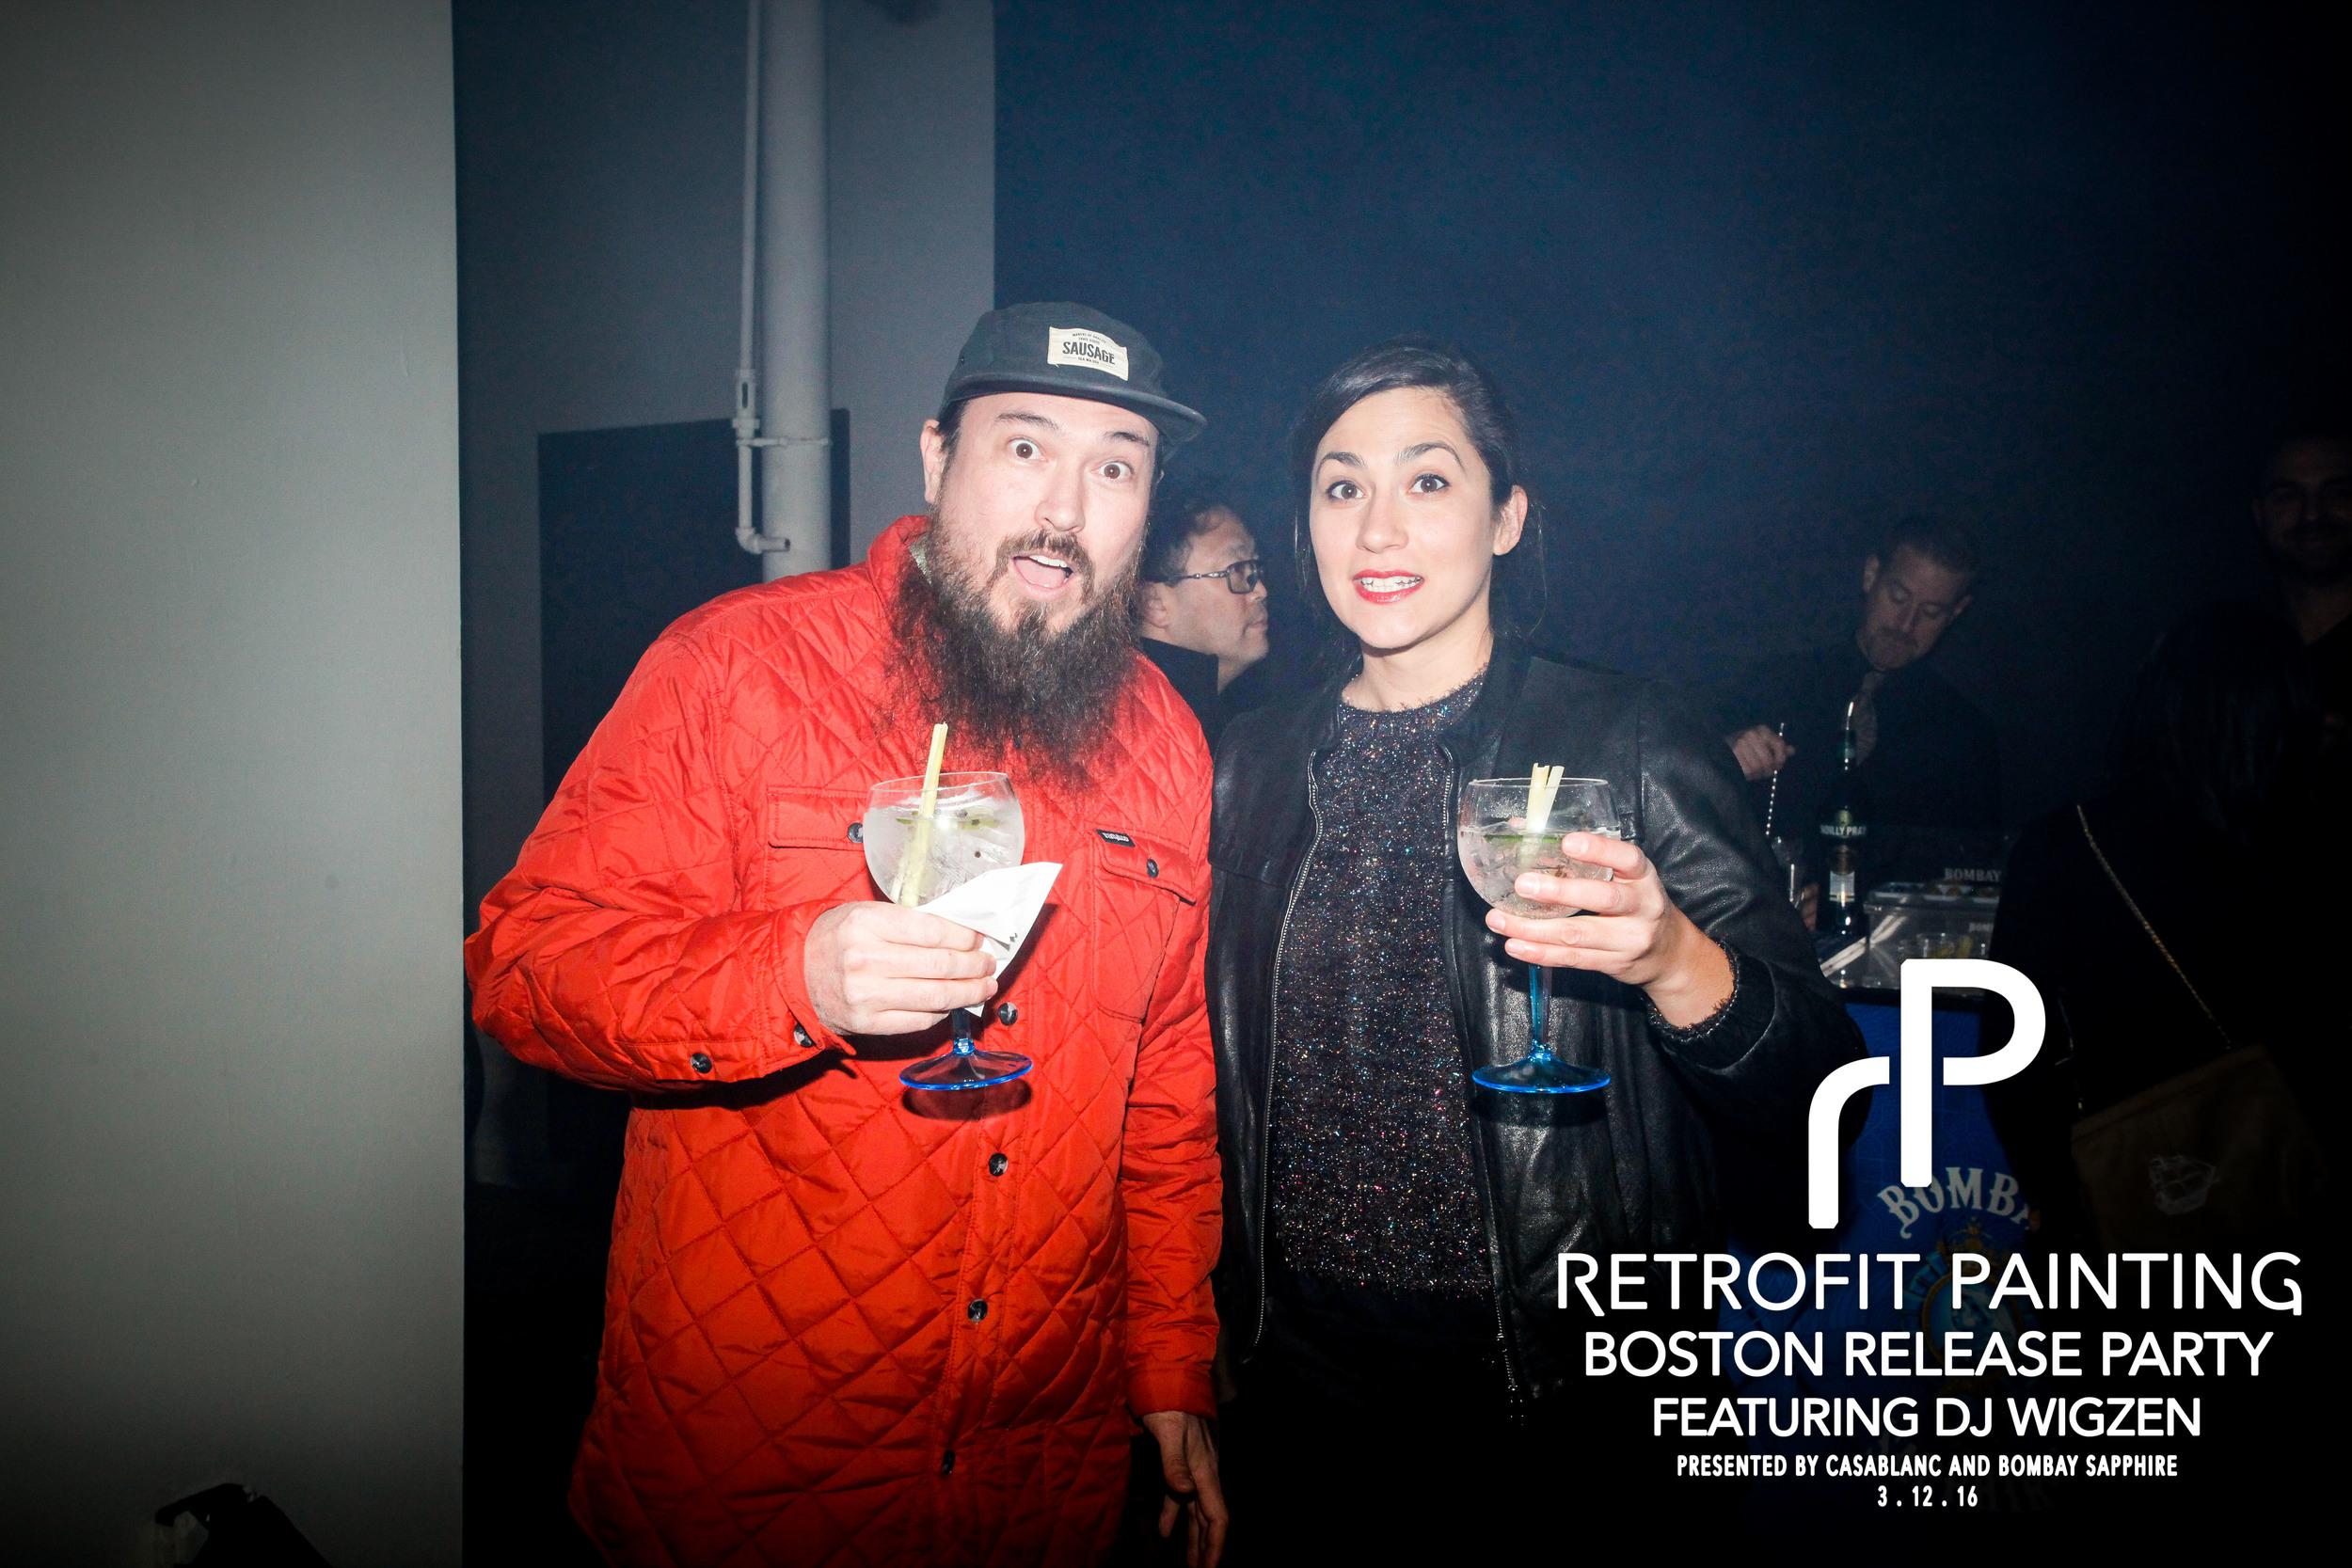 Retrofit Painting Boston Release Party 0046.jpg